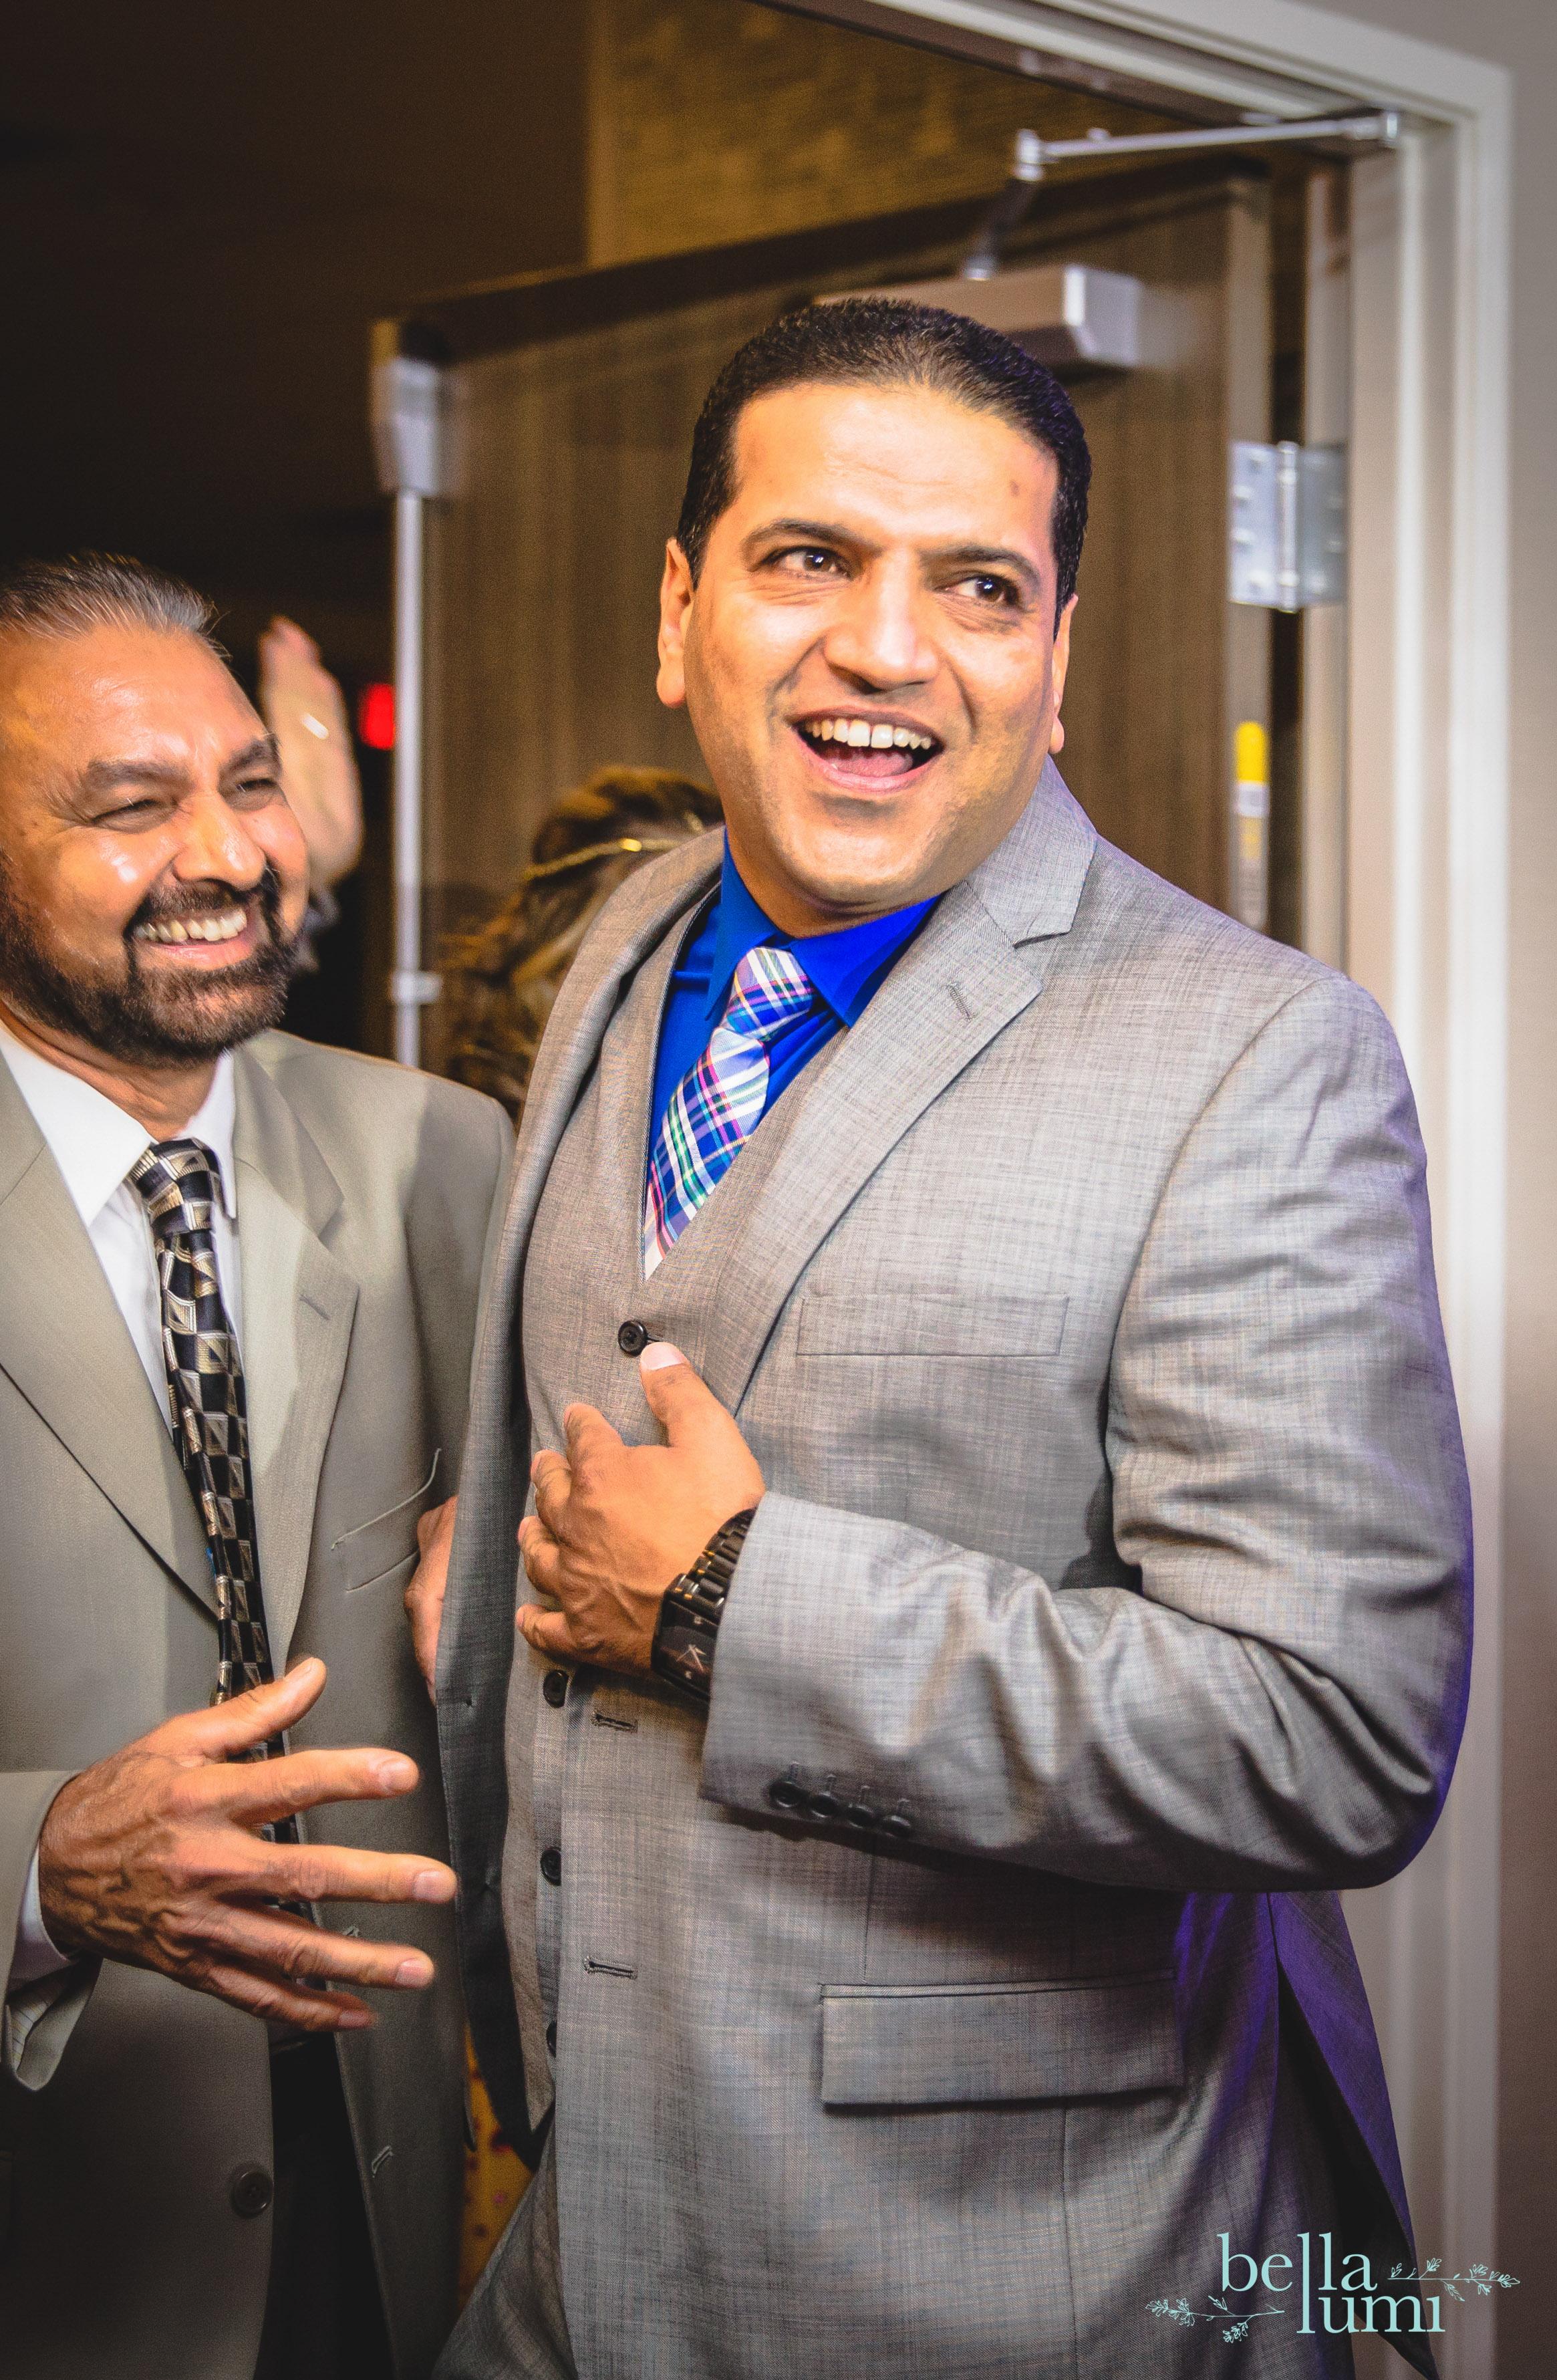 Vijay's Surprise 40th Party! - Bella Lumi